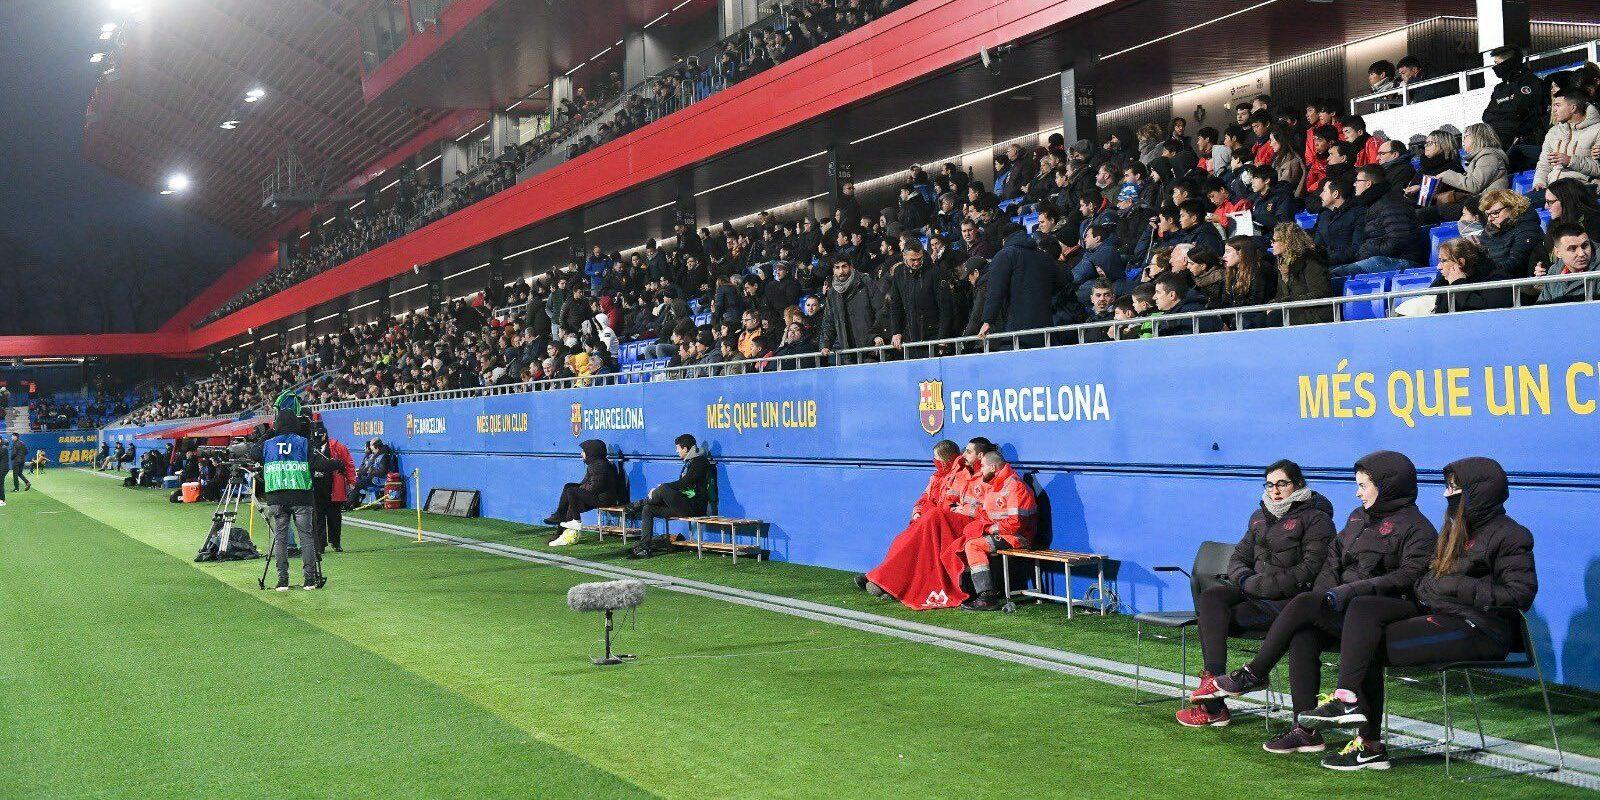 L'Estadi Johan Cruyff, en arxiu   FC Barcelona